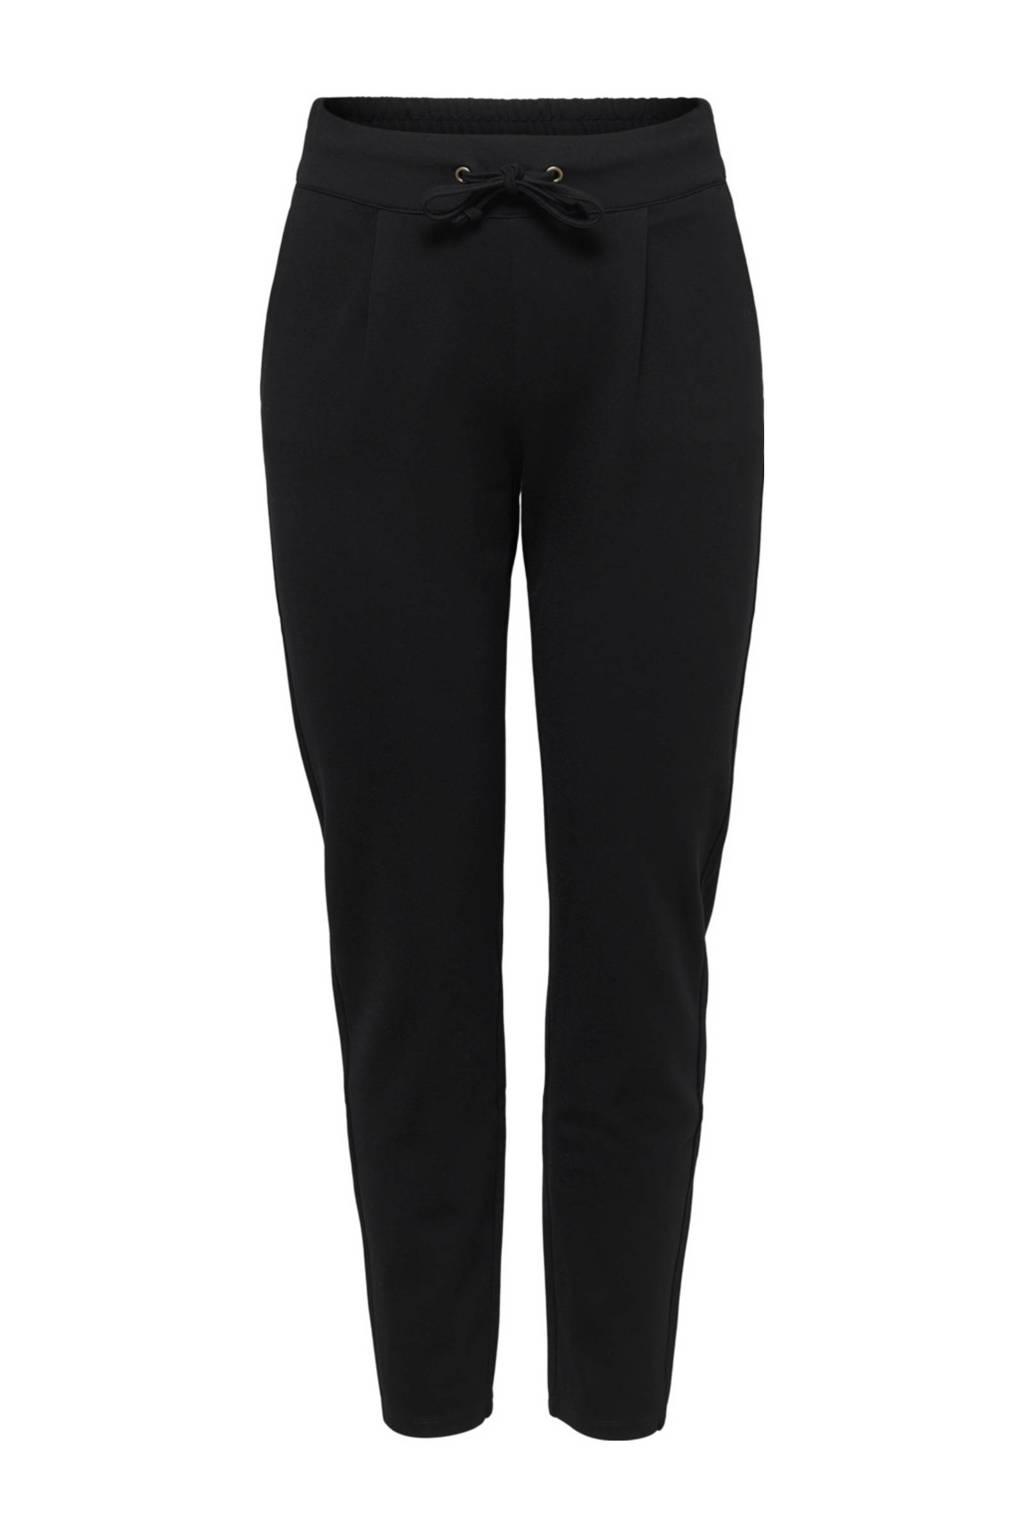 JACQUELINE DE YONG fijn gewoven broek zwart, Zwart